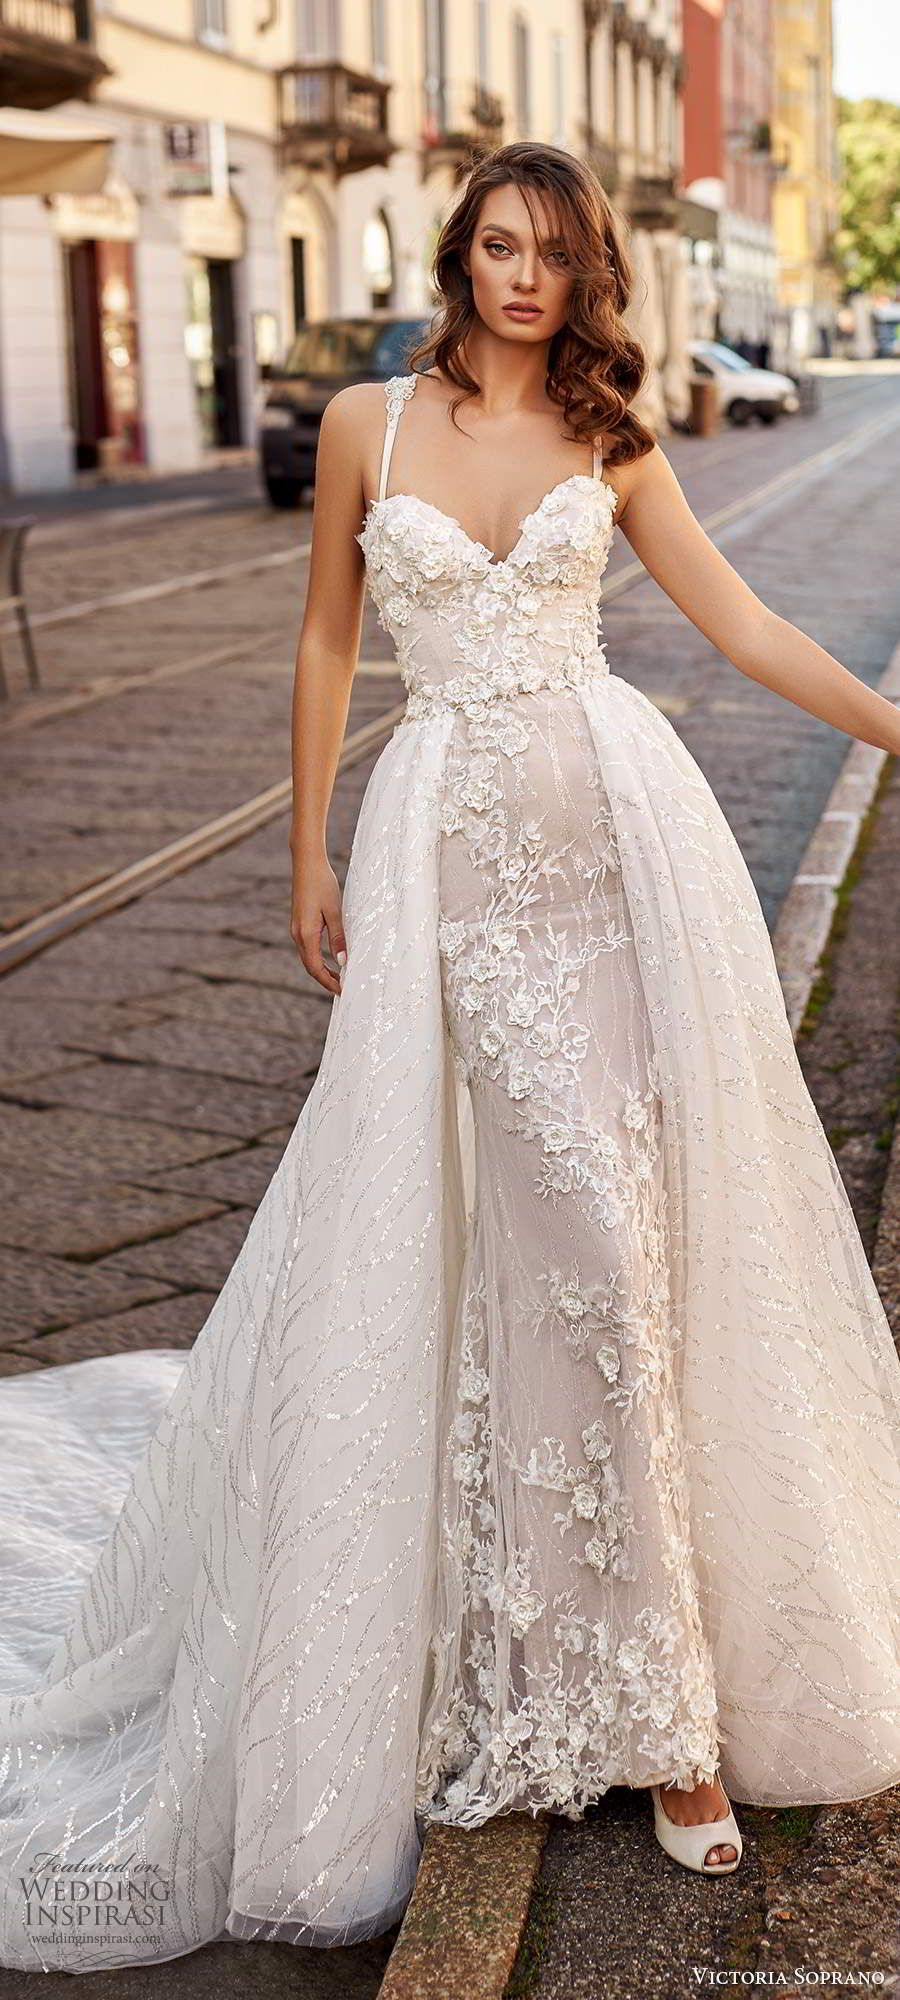 Victoria Soprano 2020 Star Of Milan Wedding Dresses Wedding Inspirasi Wedding Dresses Unique Wedding Dresses Vintage Princess Wedding Dresses [ 2000 x 900 Pixel ]